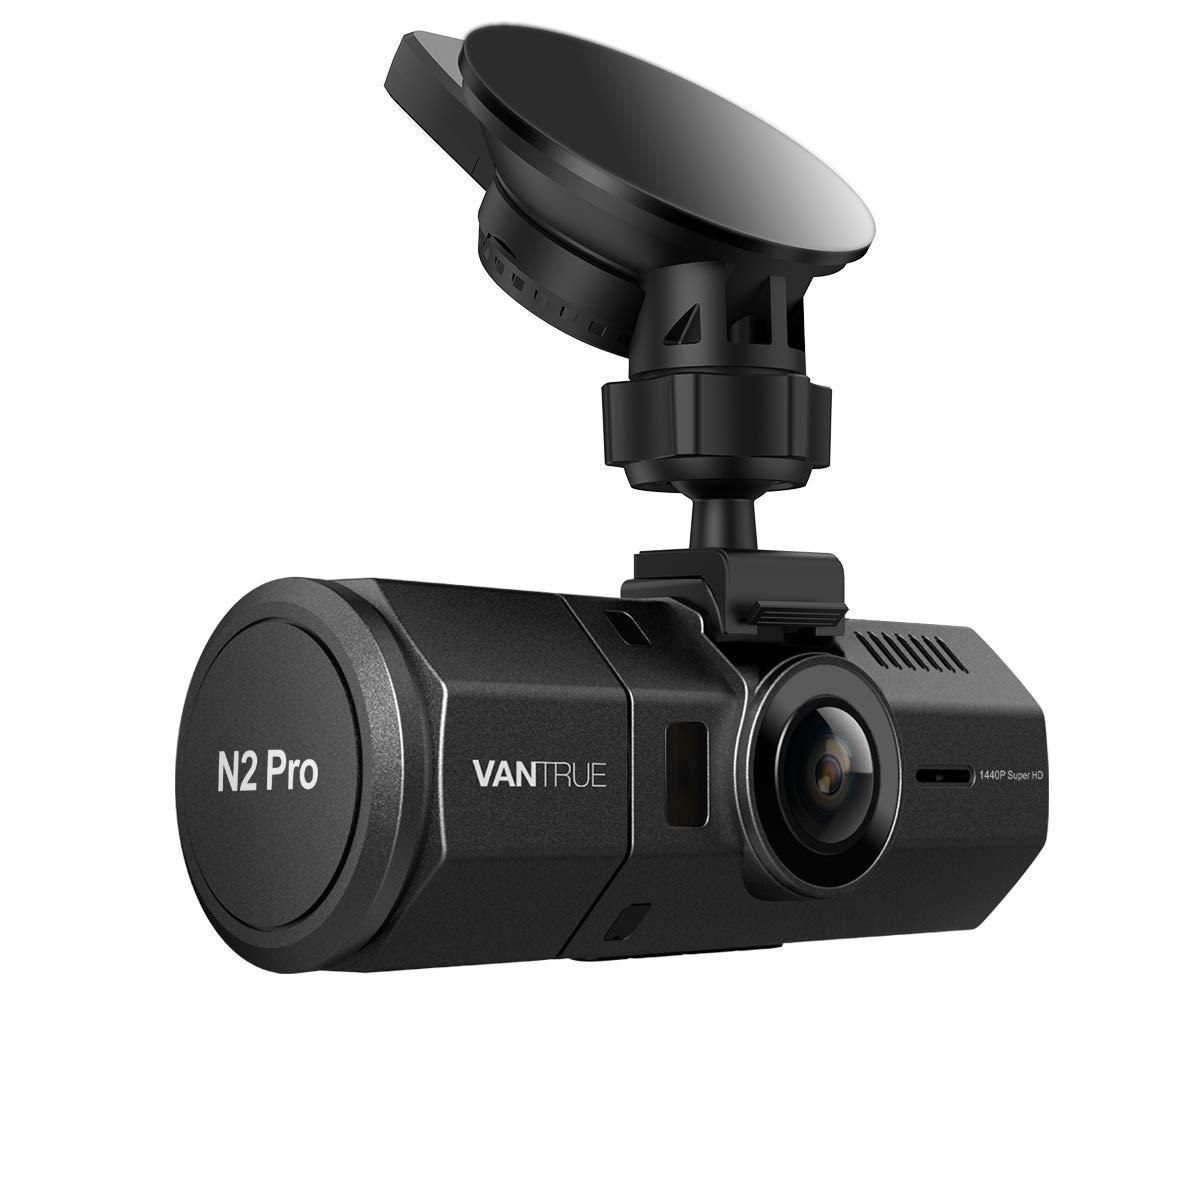 Best car security camera